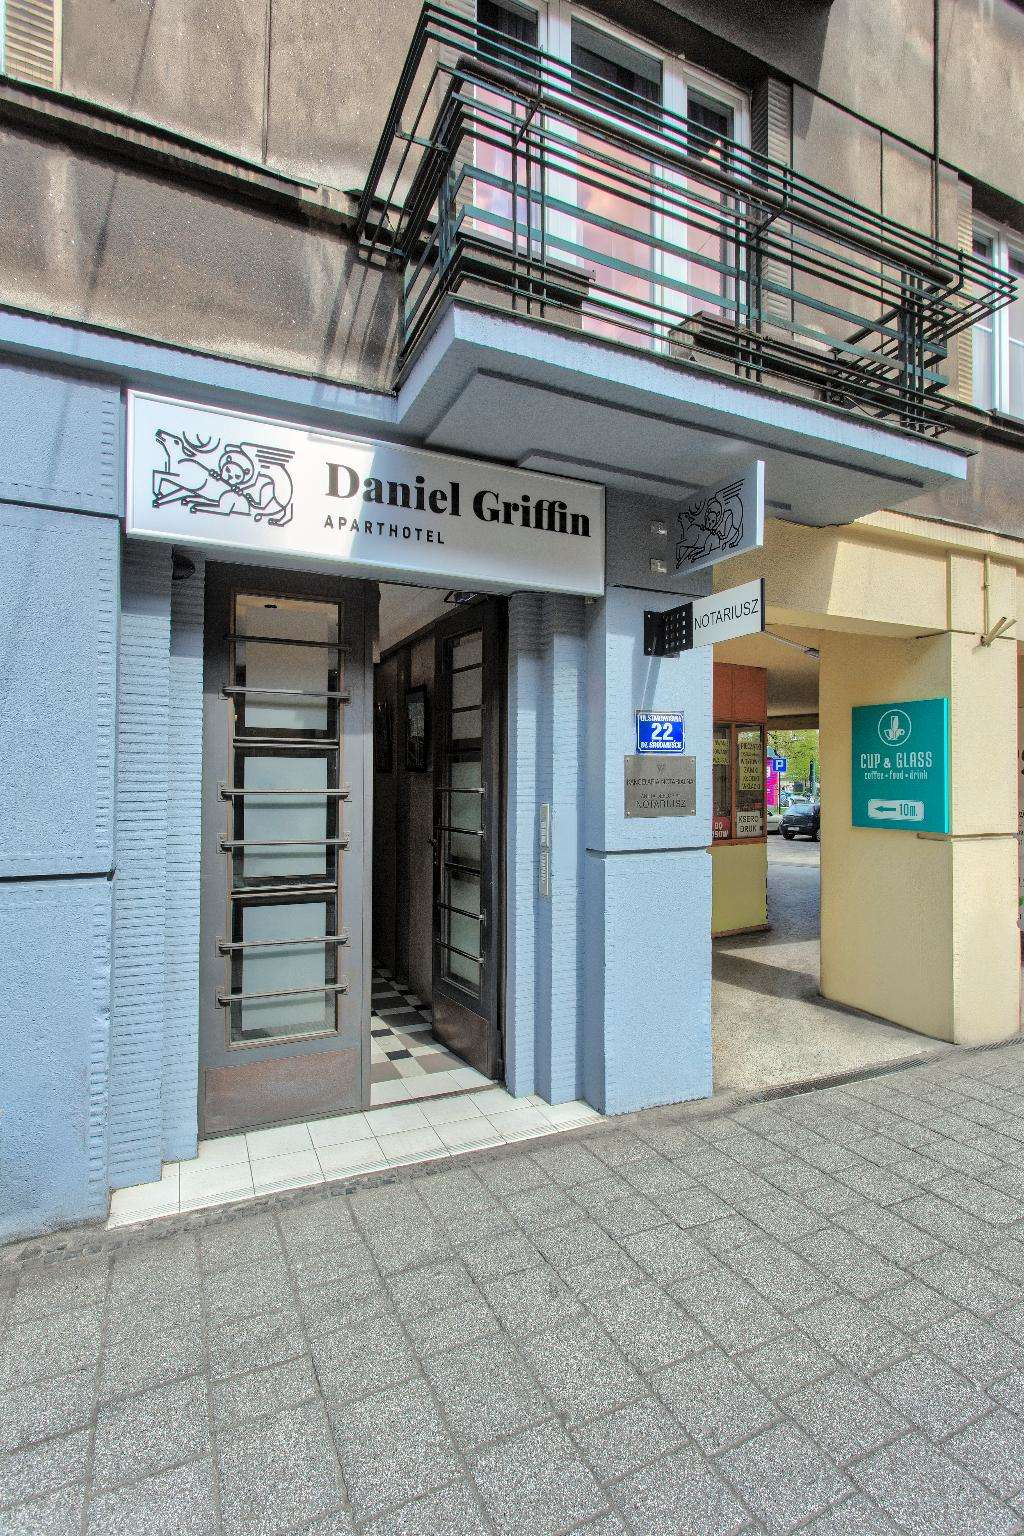 Daniel Griffin Aparthotel (ex Bluebells)